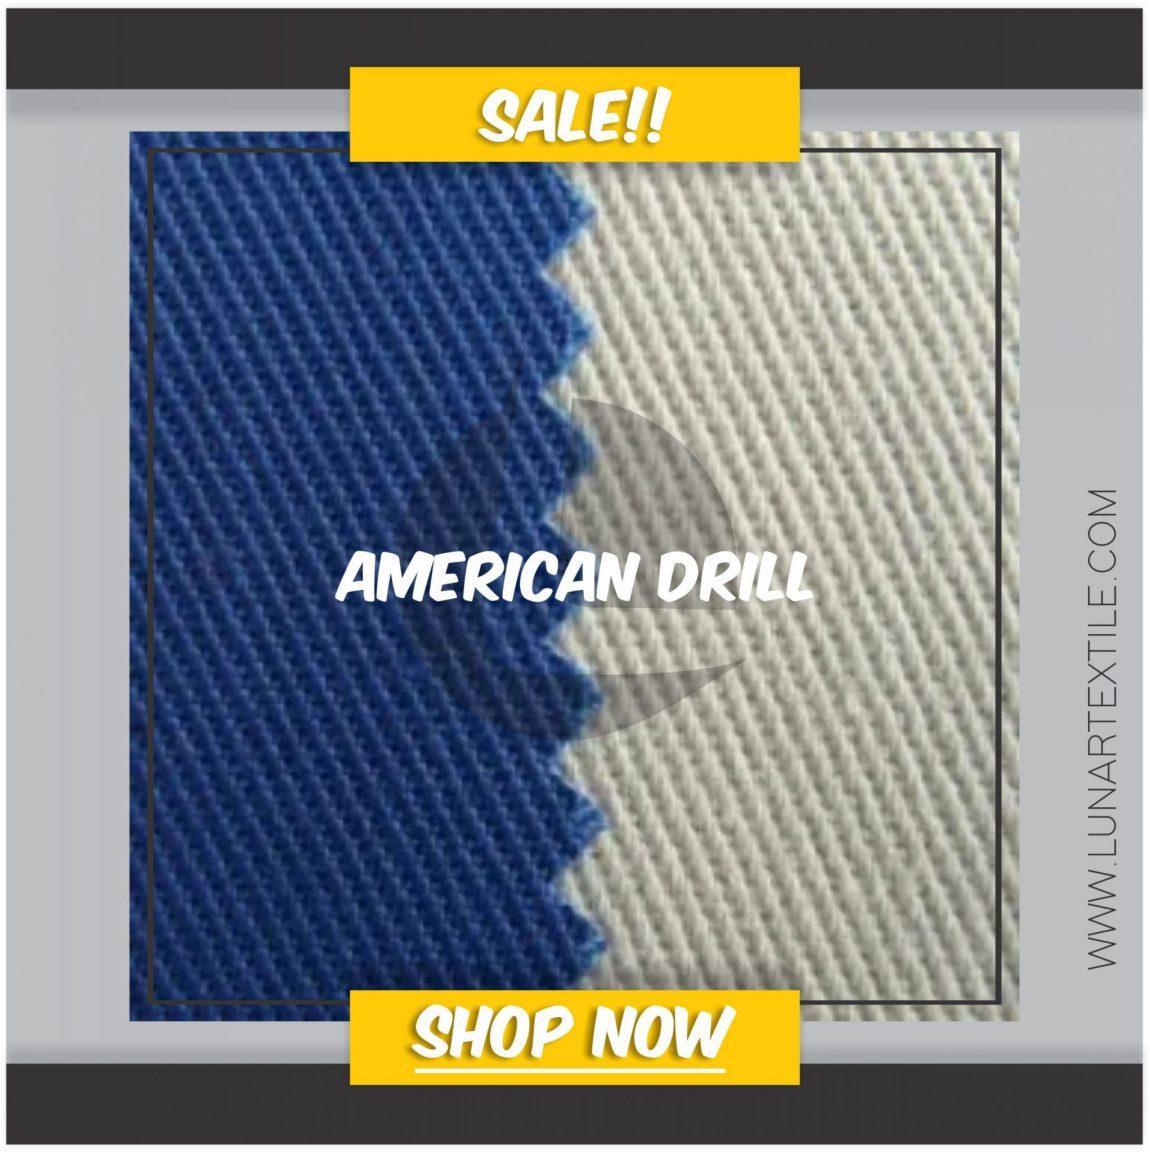 Bahan Unione Drill Untuk kemeja & Jaket